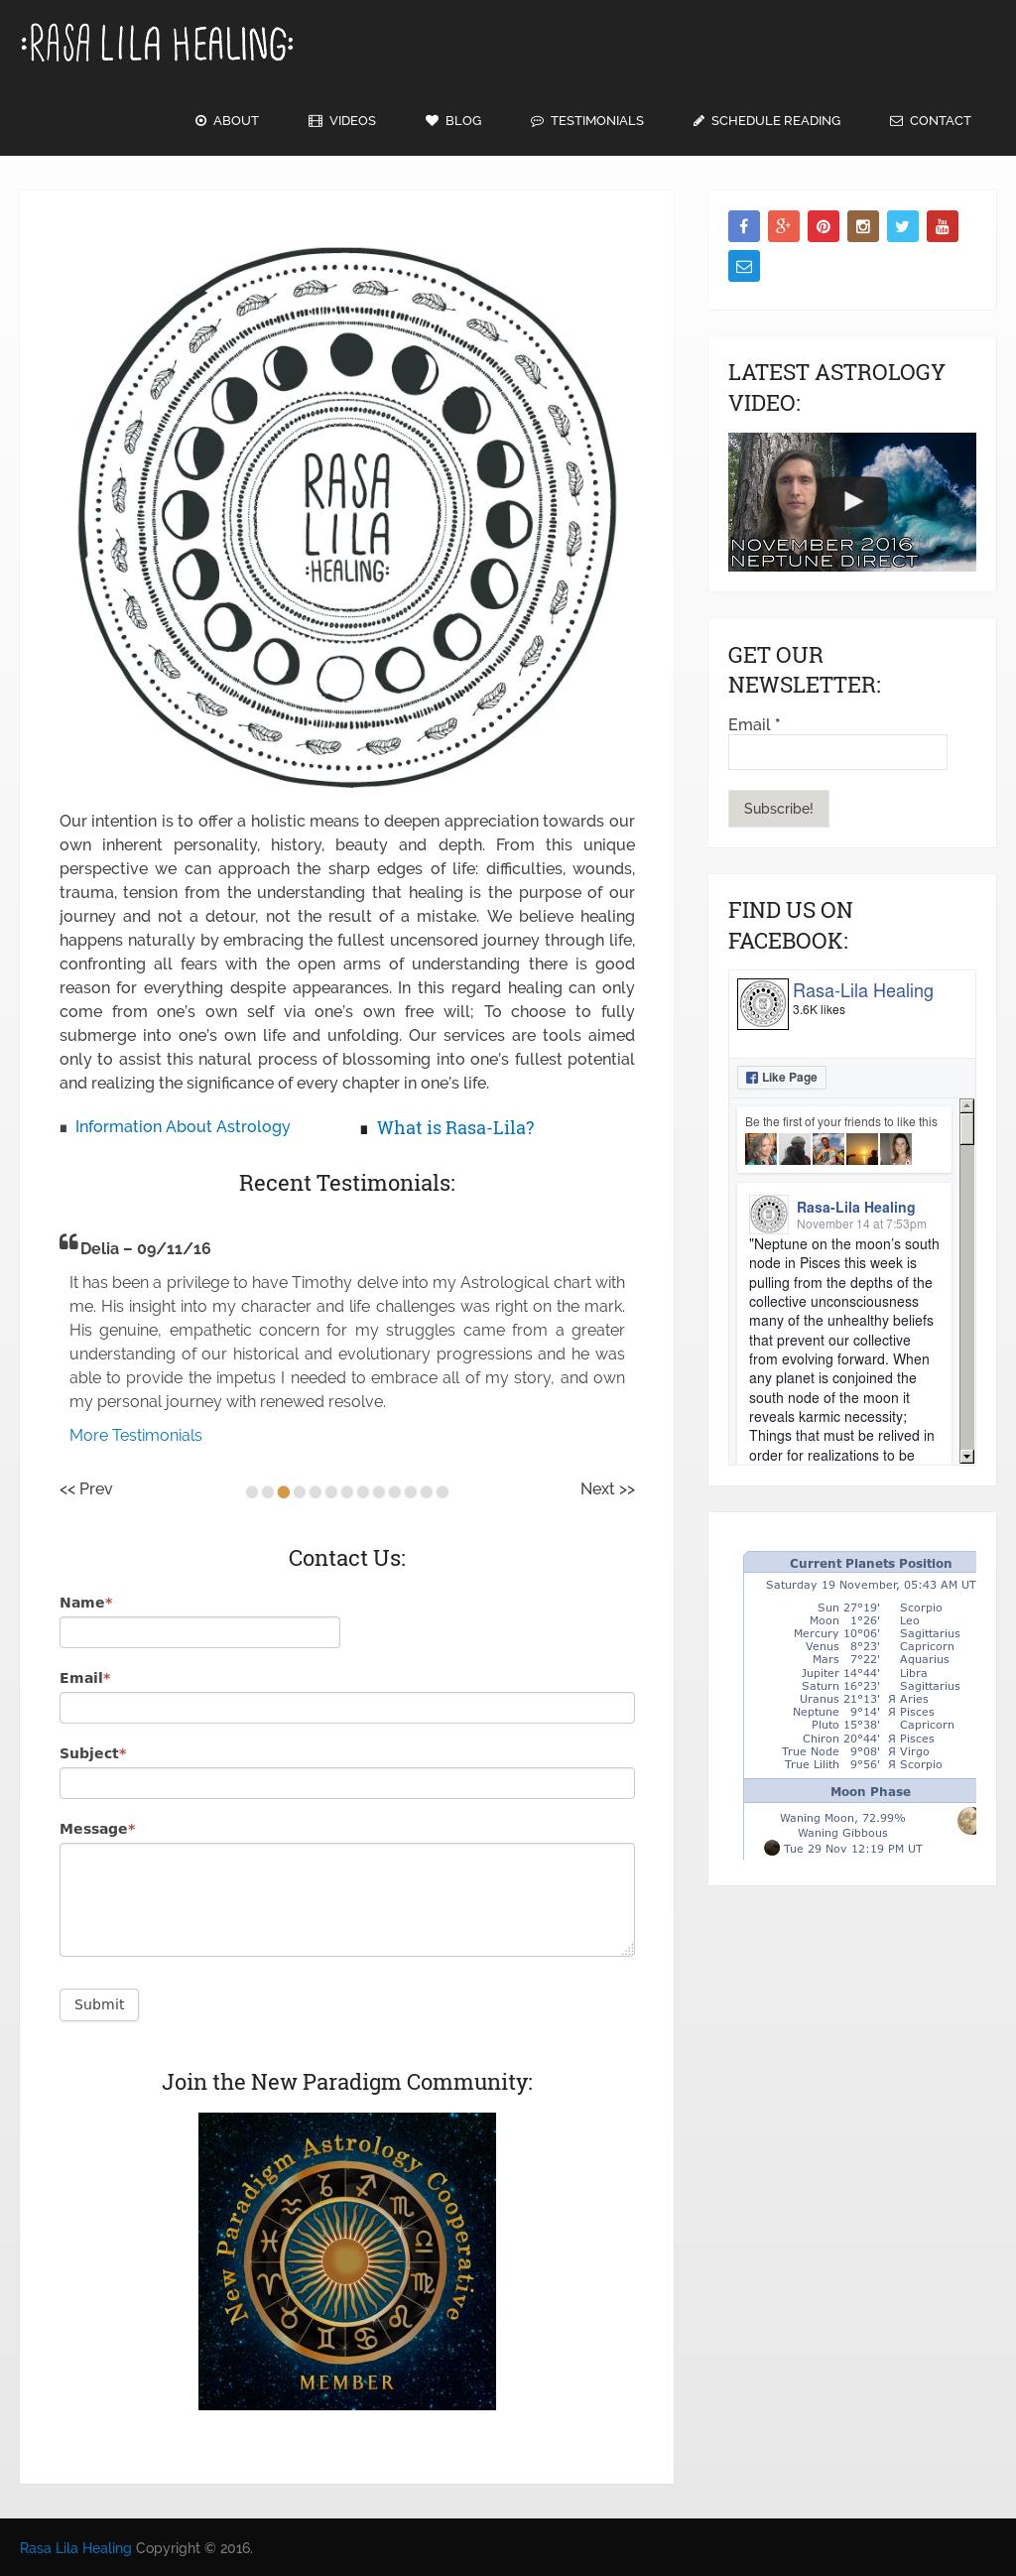 Rasa-lila Healing Competitors, Revenue and Employees - Owler Company